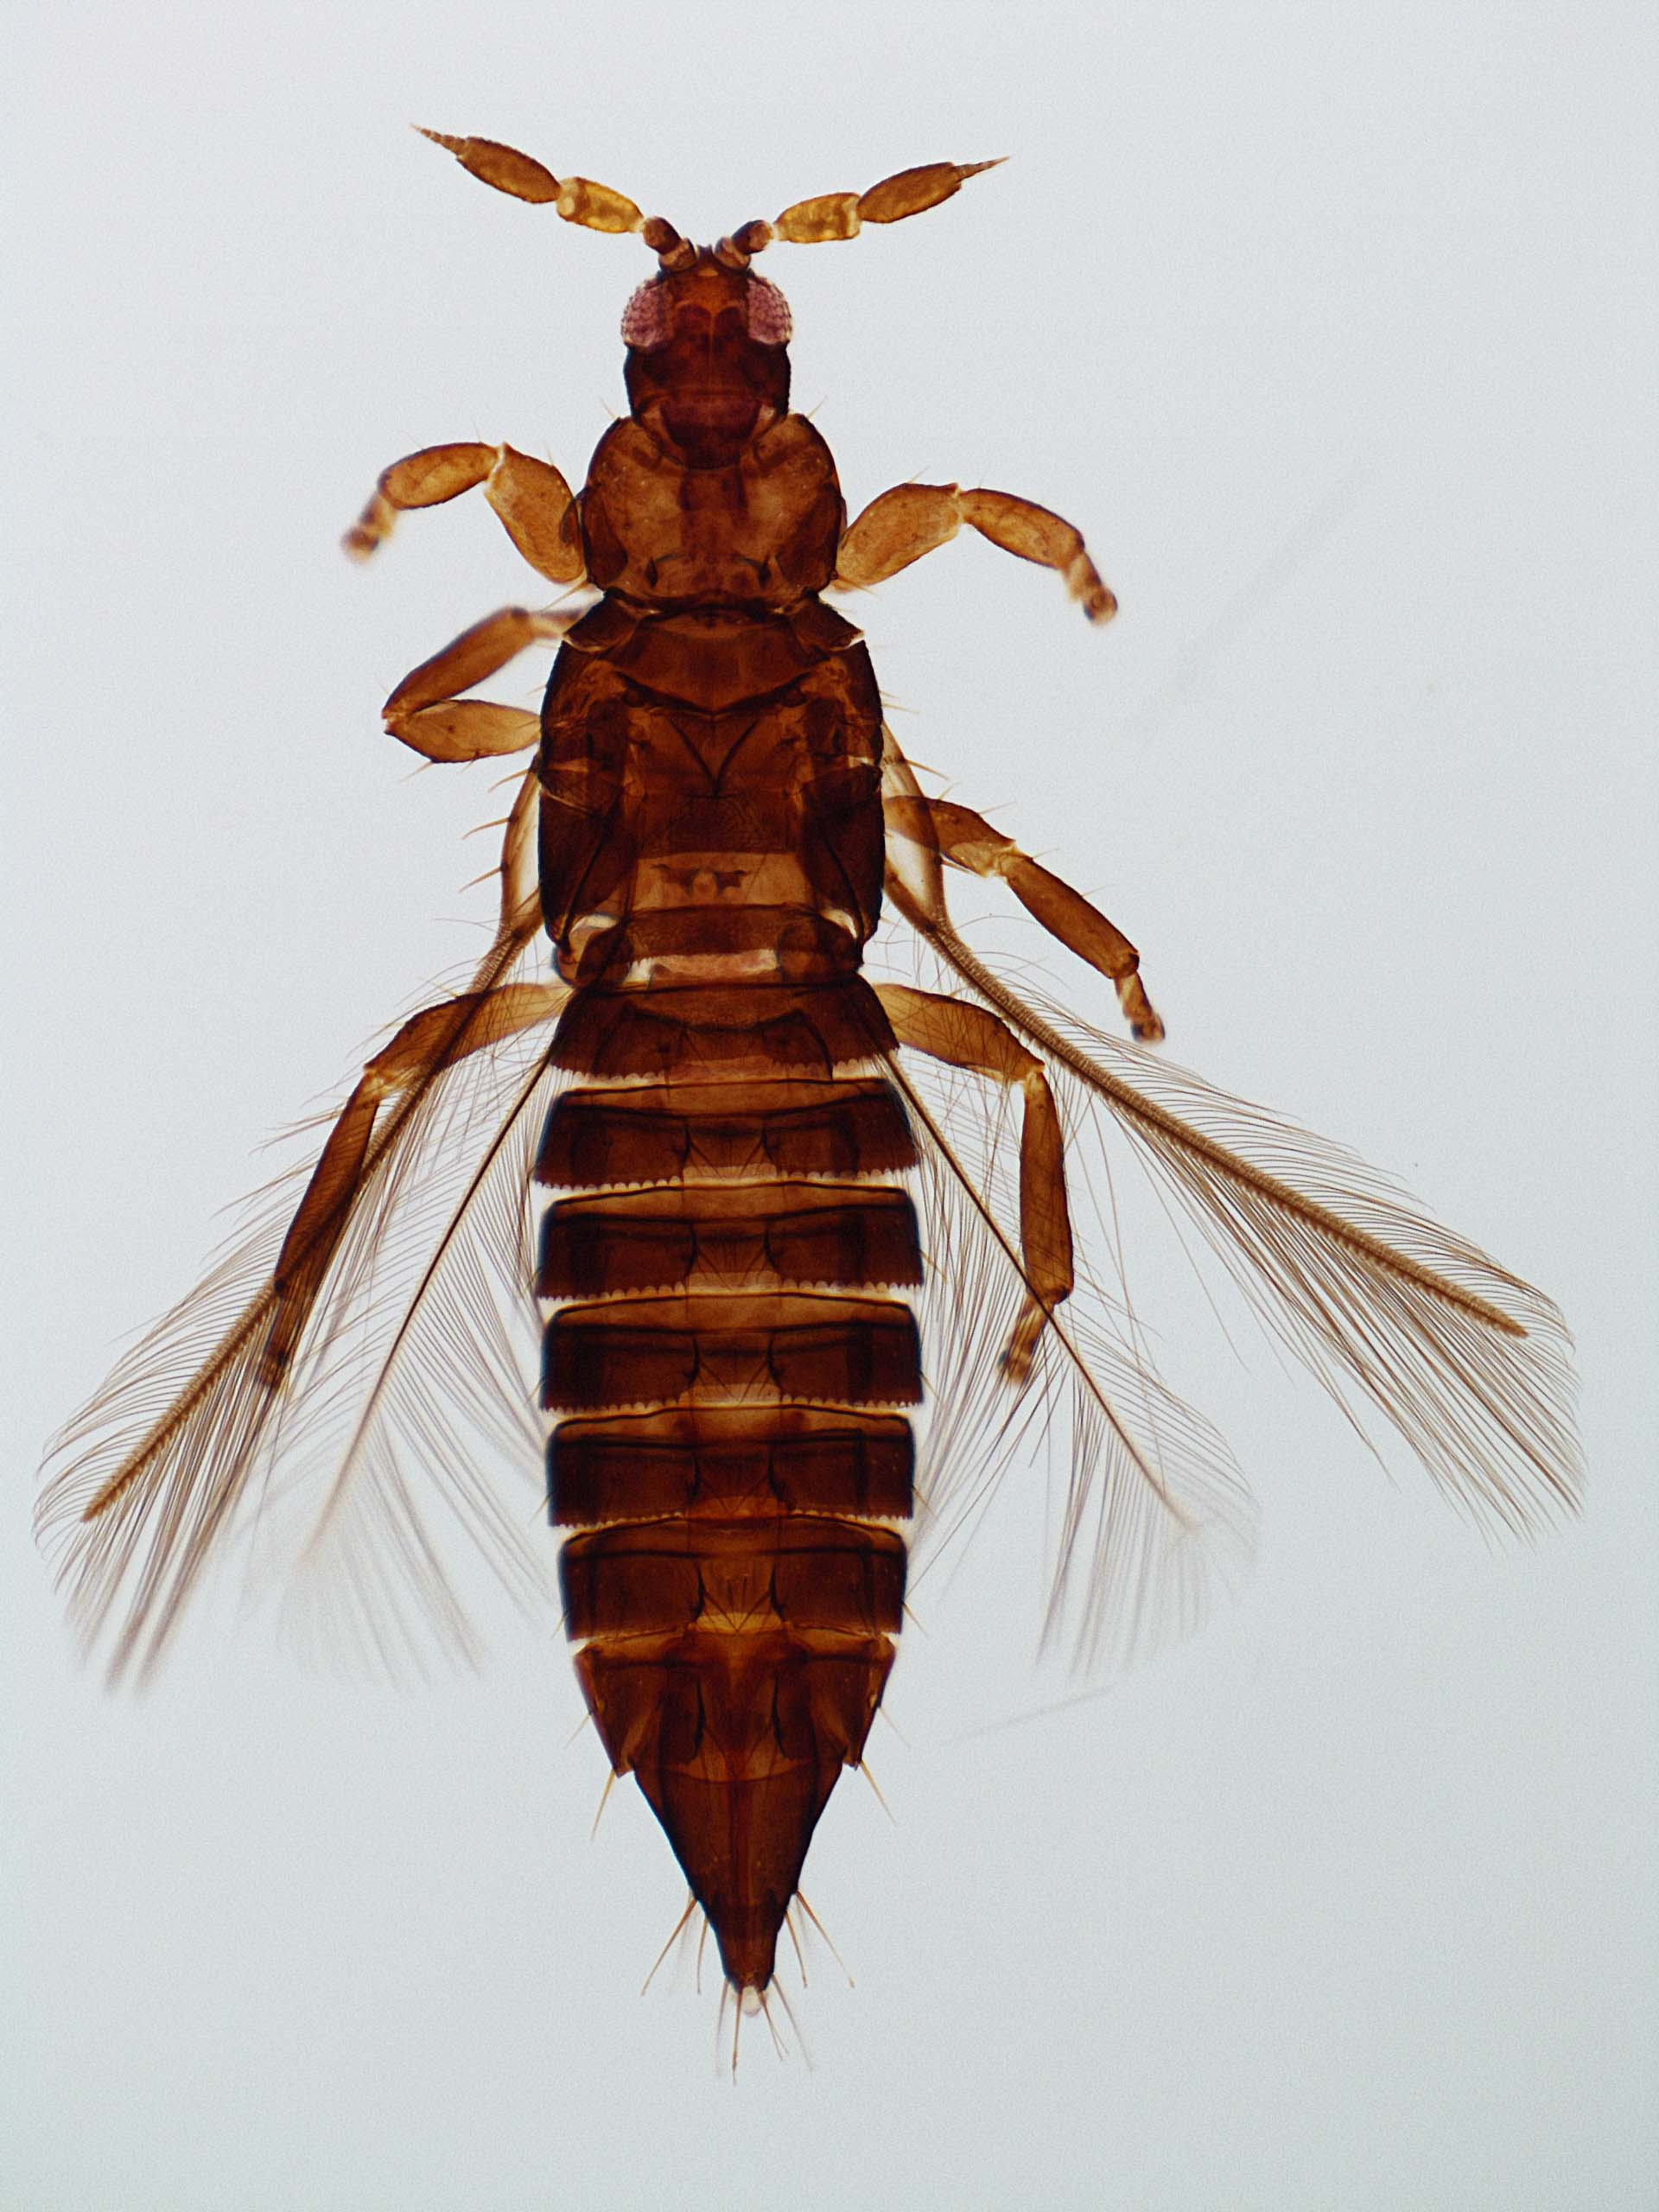 Aulacothrips dictyotus